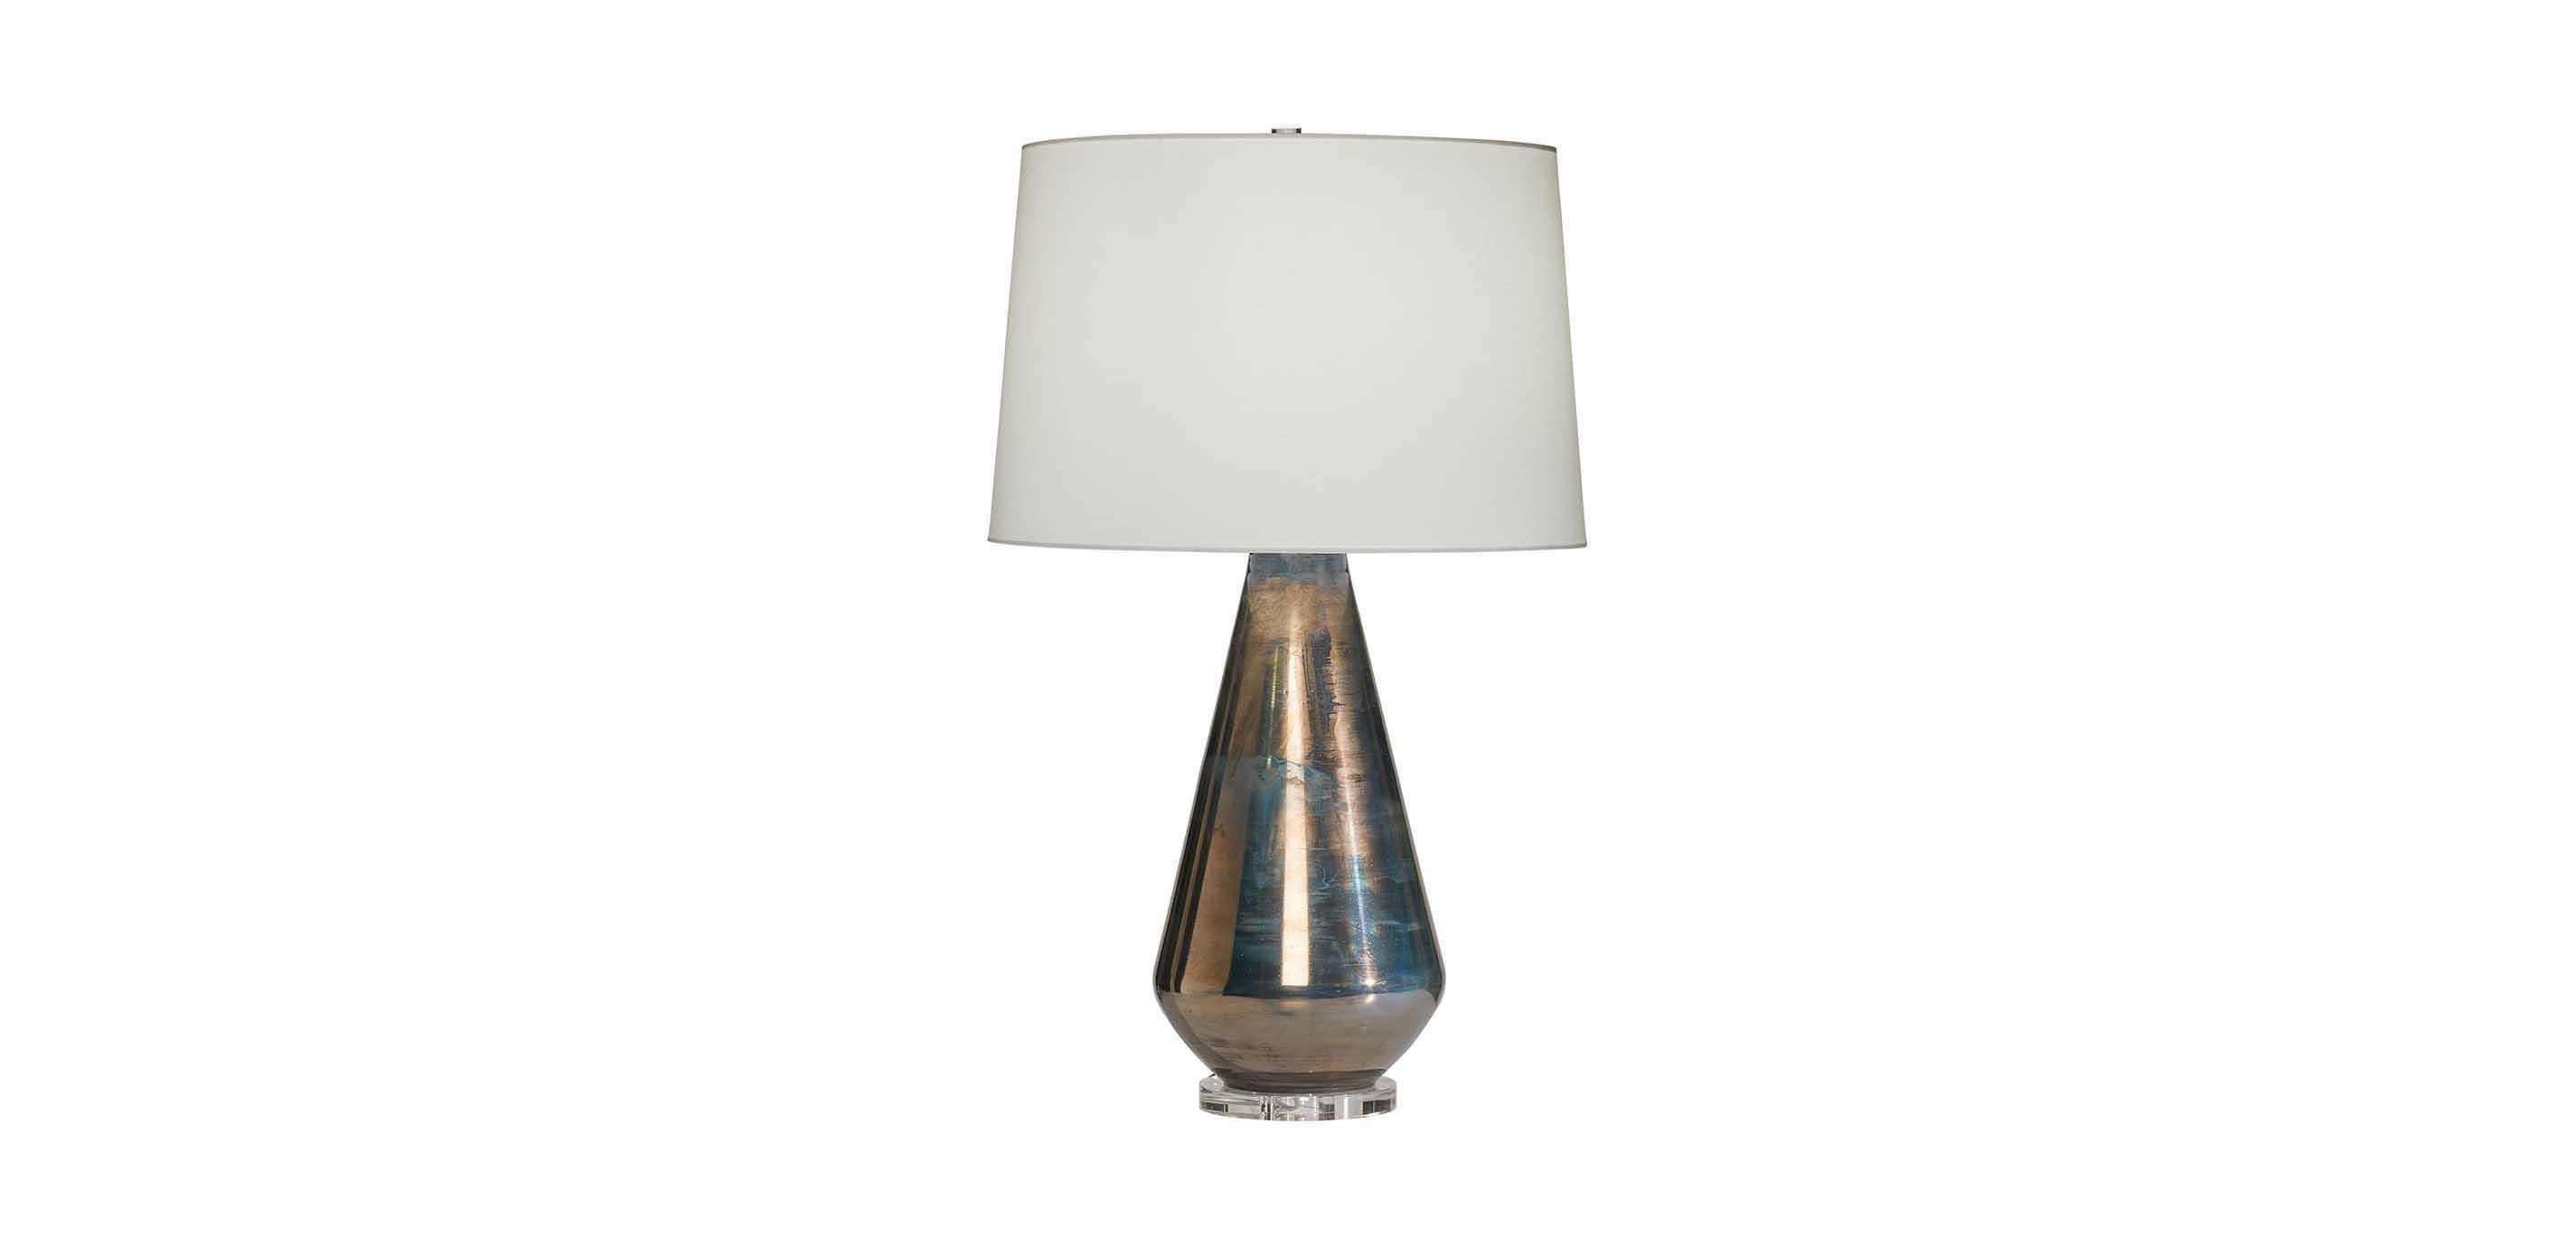 Marian Table Lamp Lighting Ethan Allen